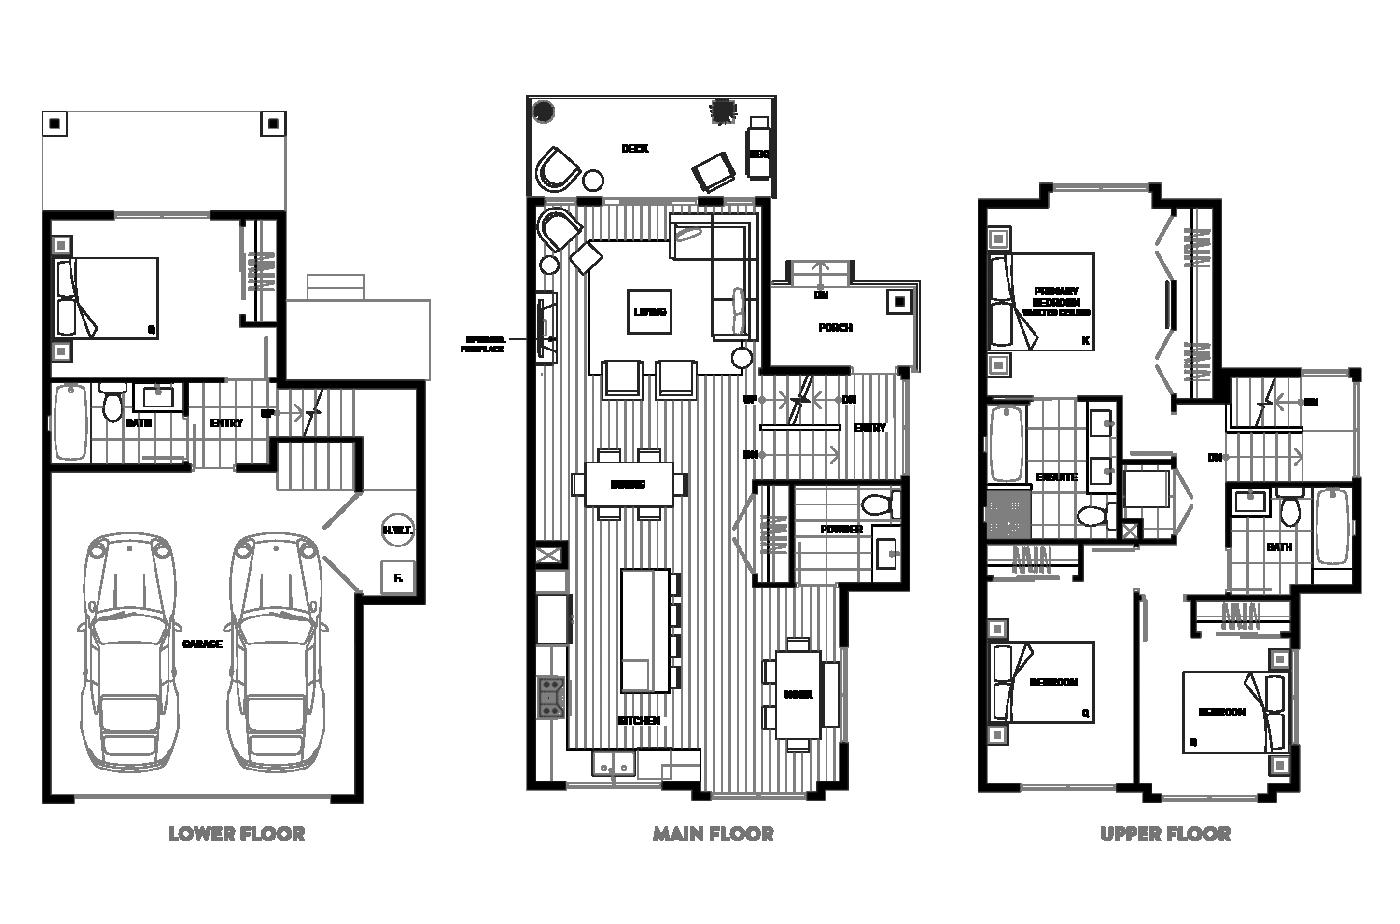 Plan D1